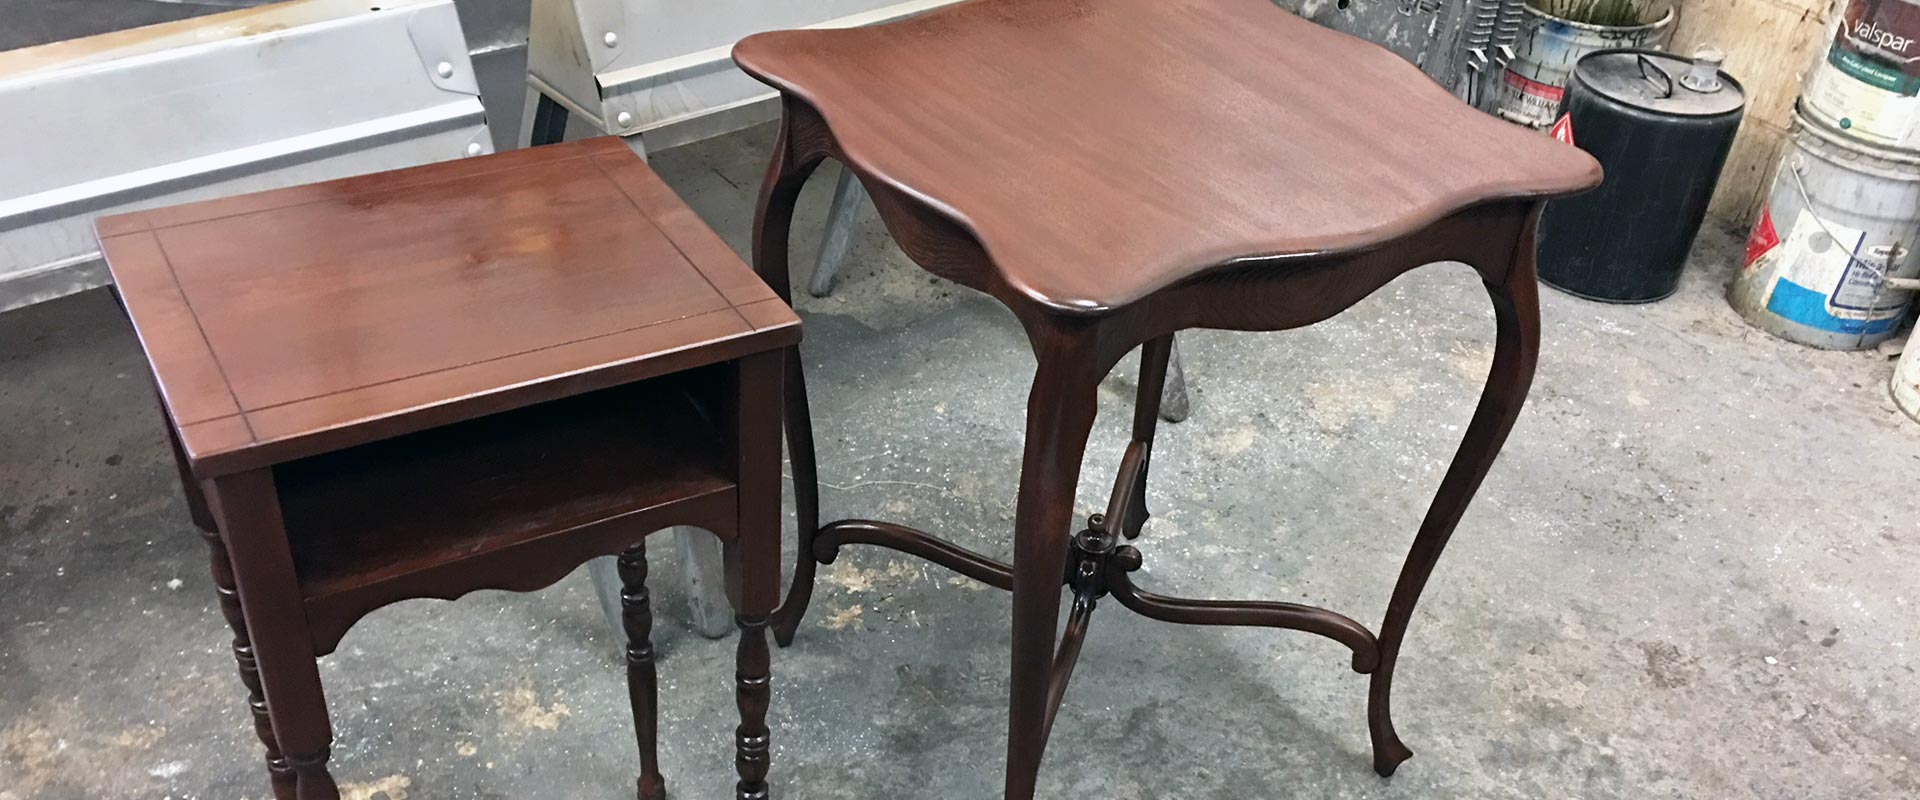 PFR-progressive-furniture-refinishing-grand-rapids-mi_slide5